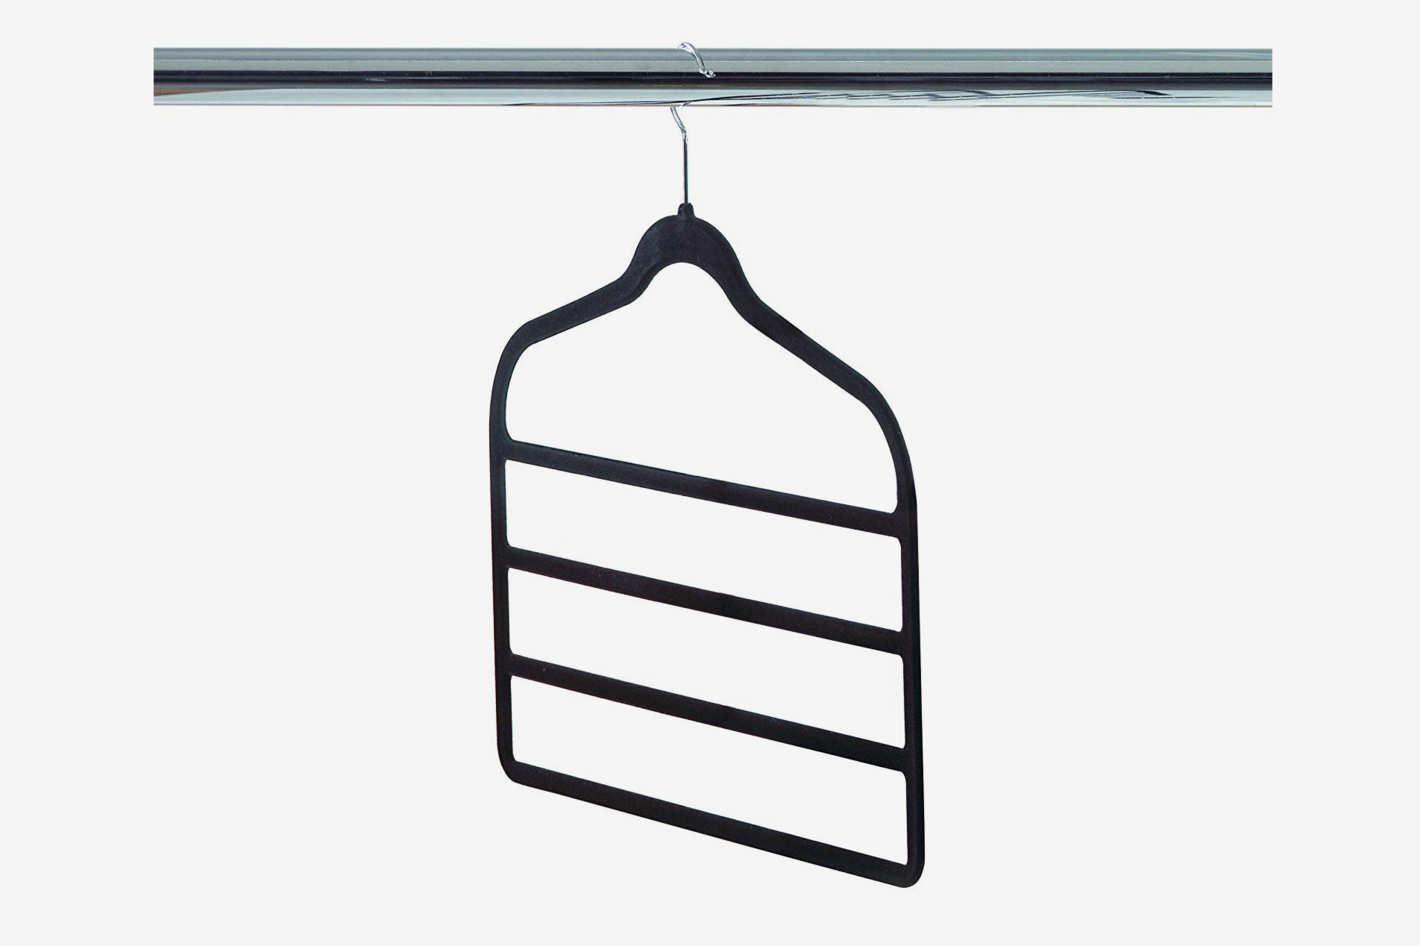 Neatfreak 4-Tier Felt Pant Hanger, Black, 3-Count